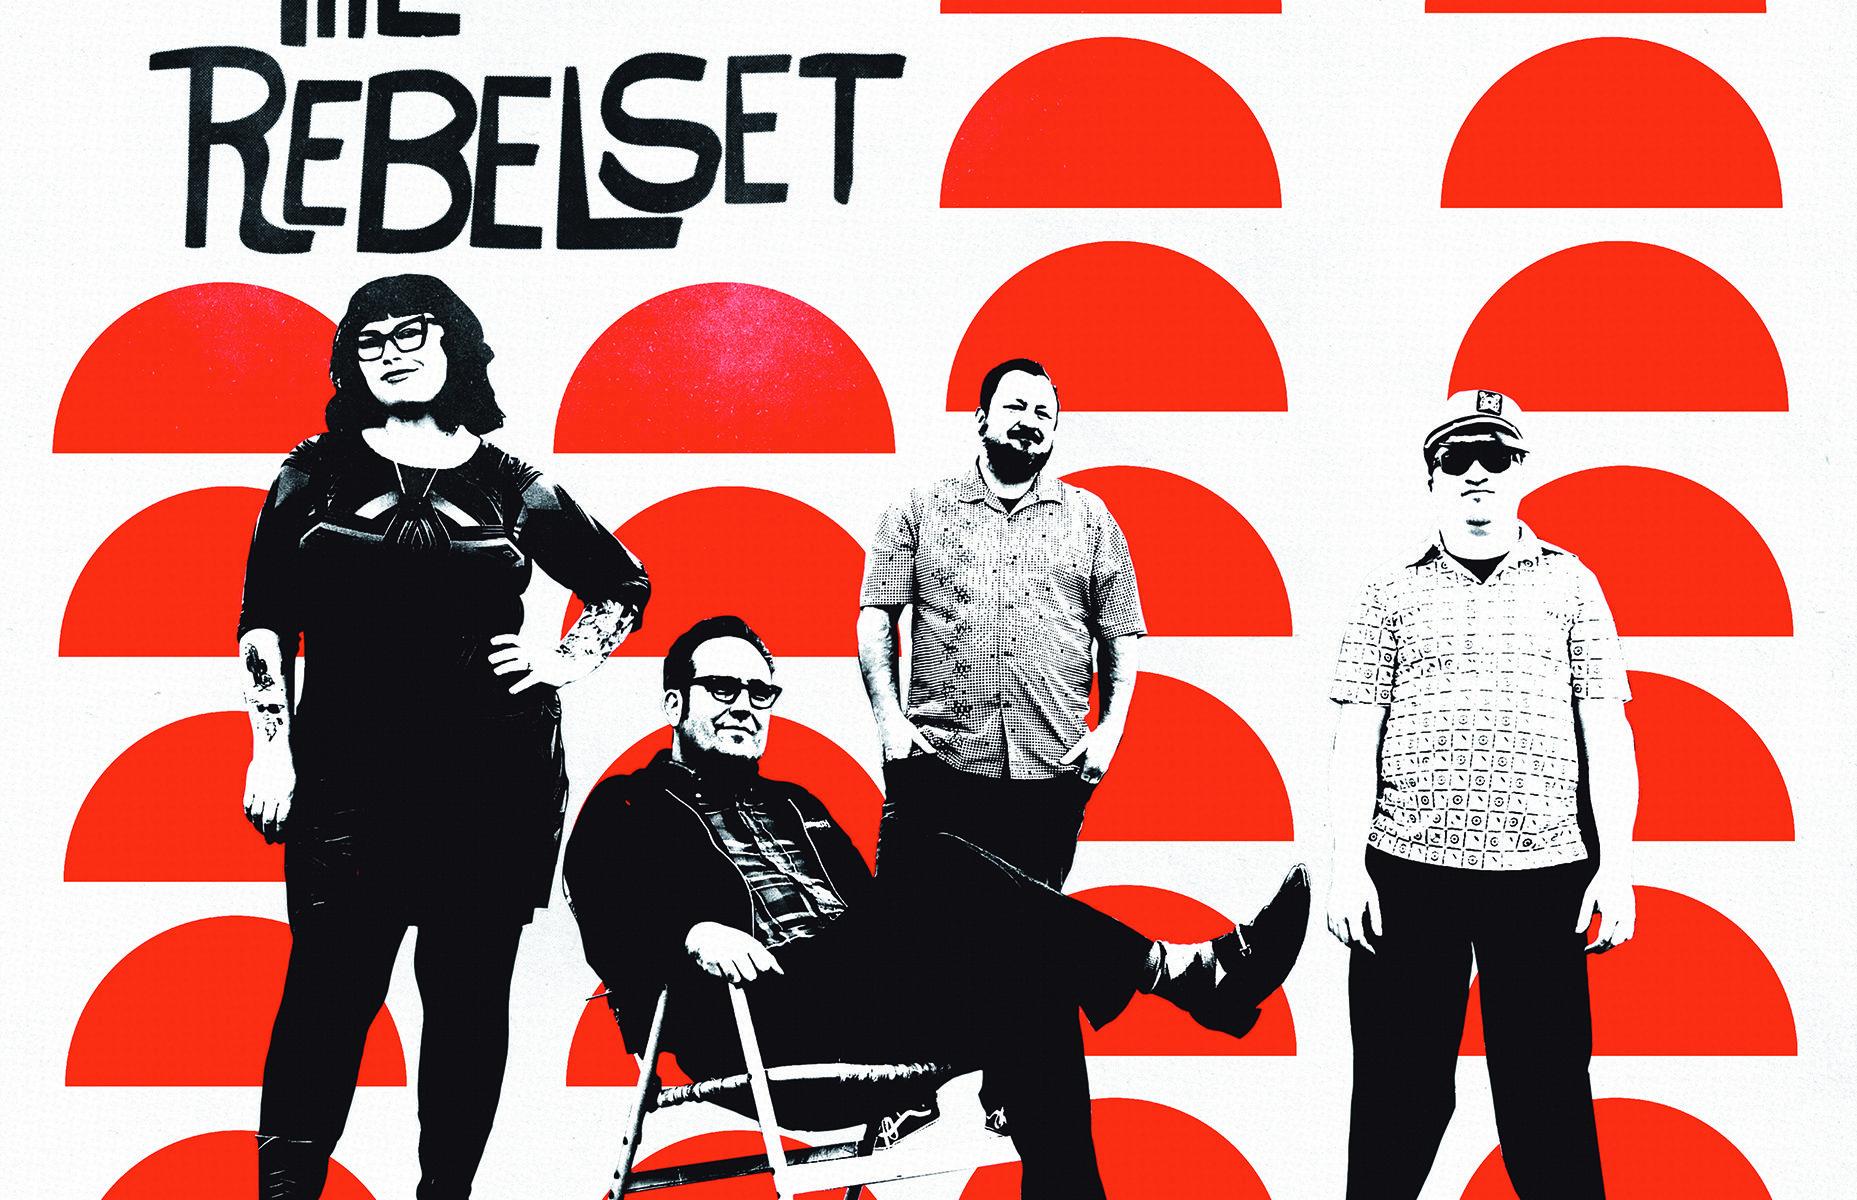 The Rebel Set | Modern Living | 3hive.com